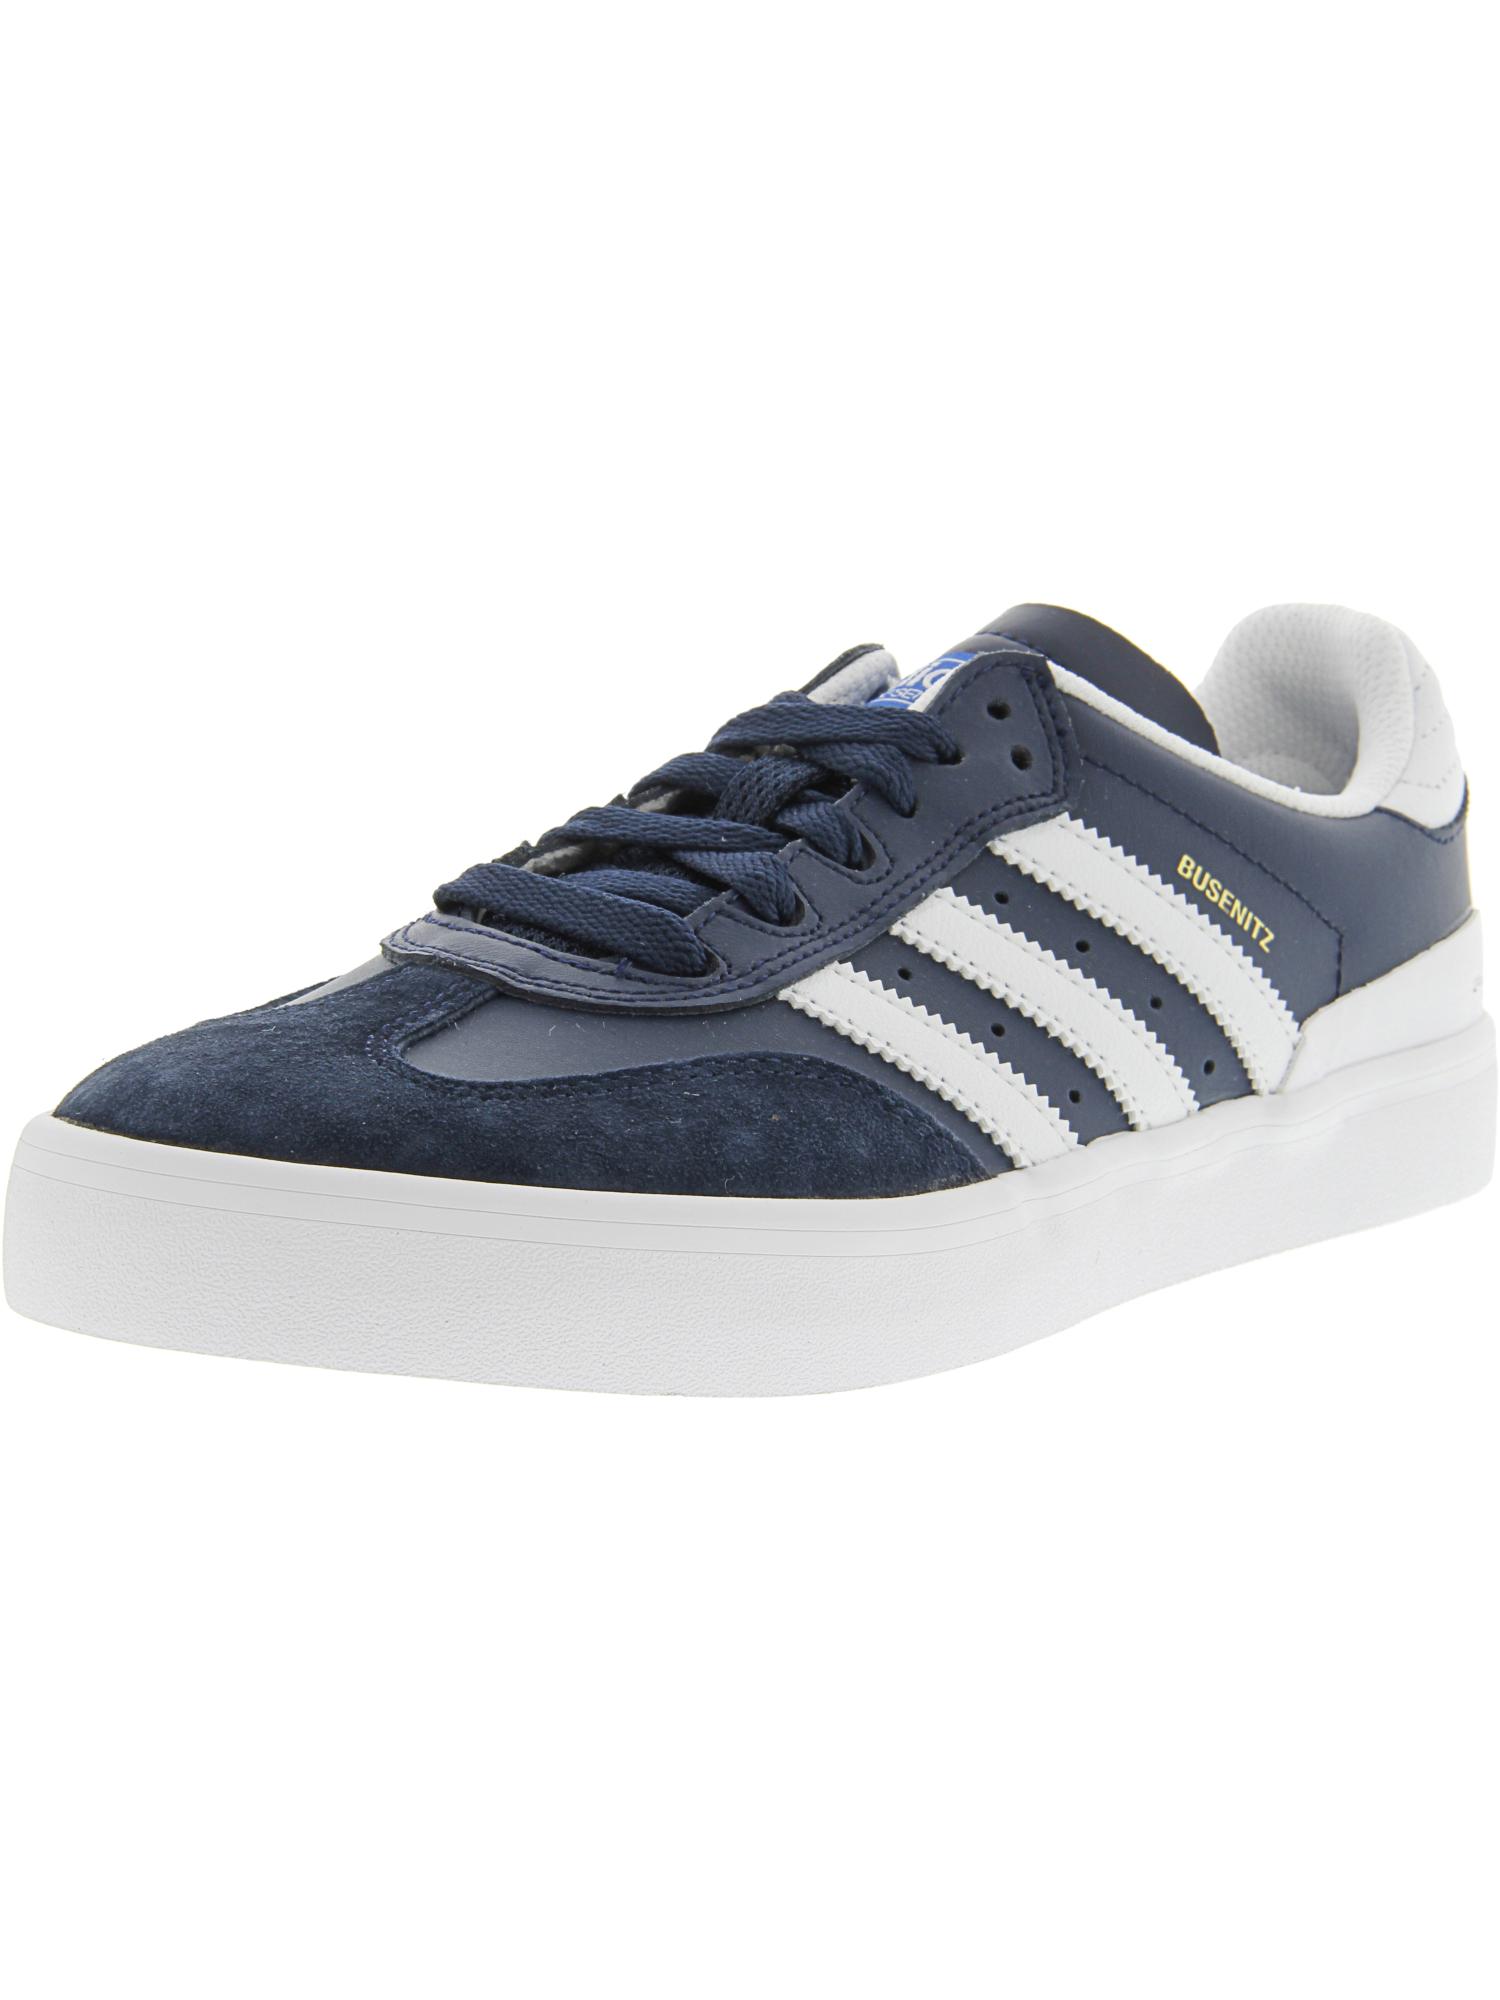 Adidas Adidas Adidas Uomo busenitz vulc rx ankle-high leather skateboarding shoe 96593d